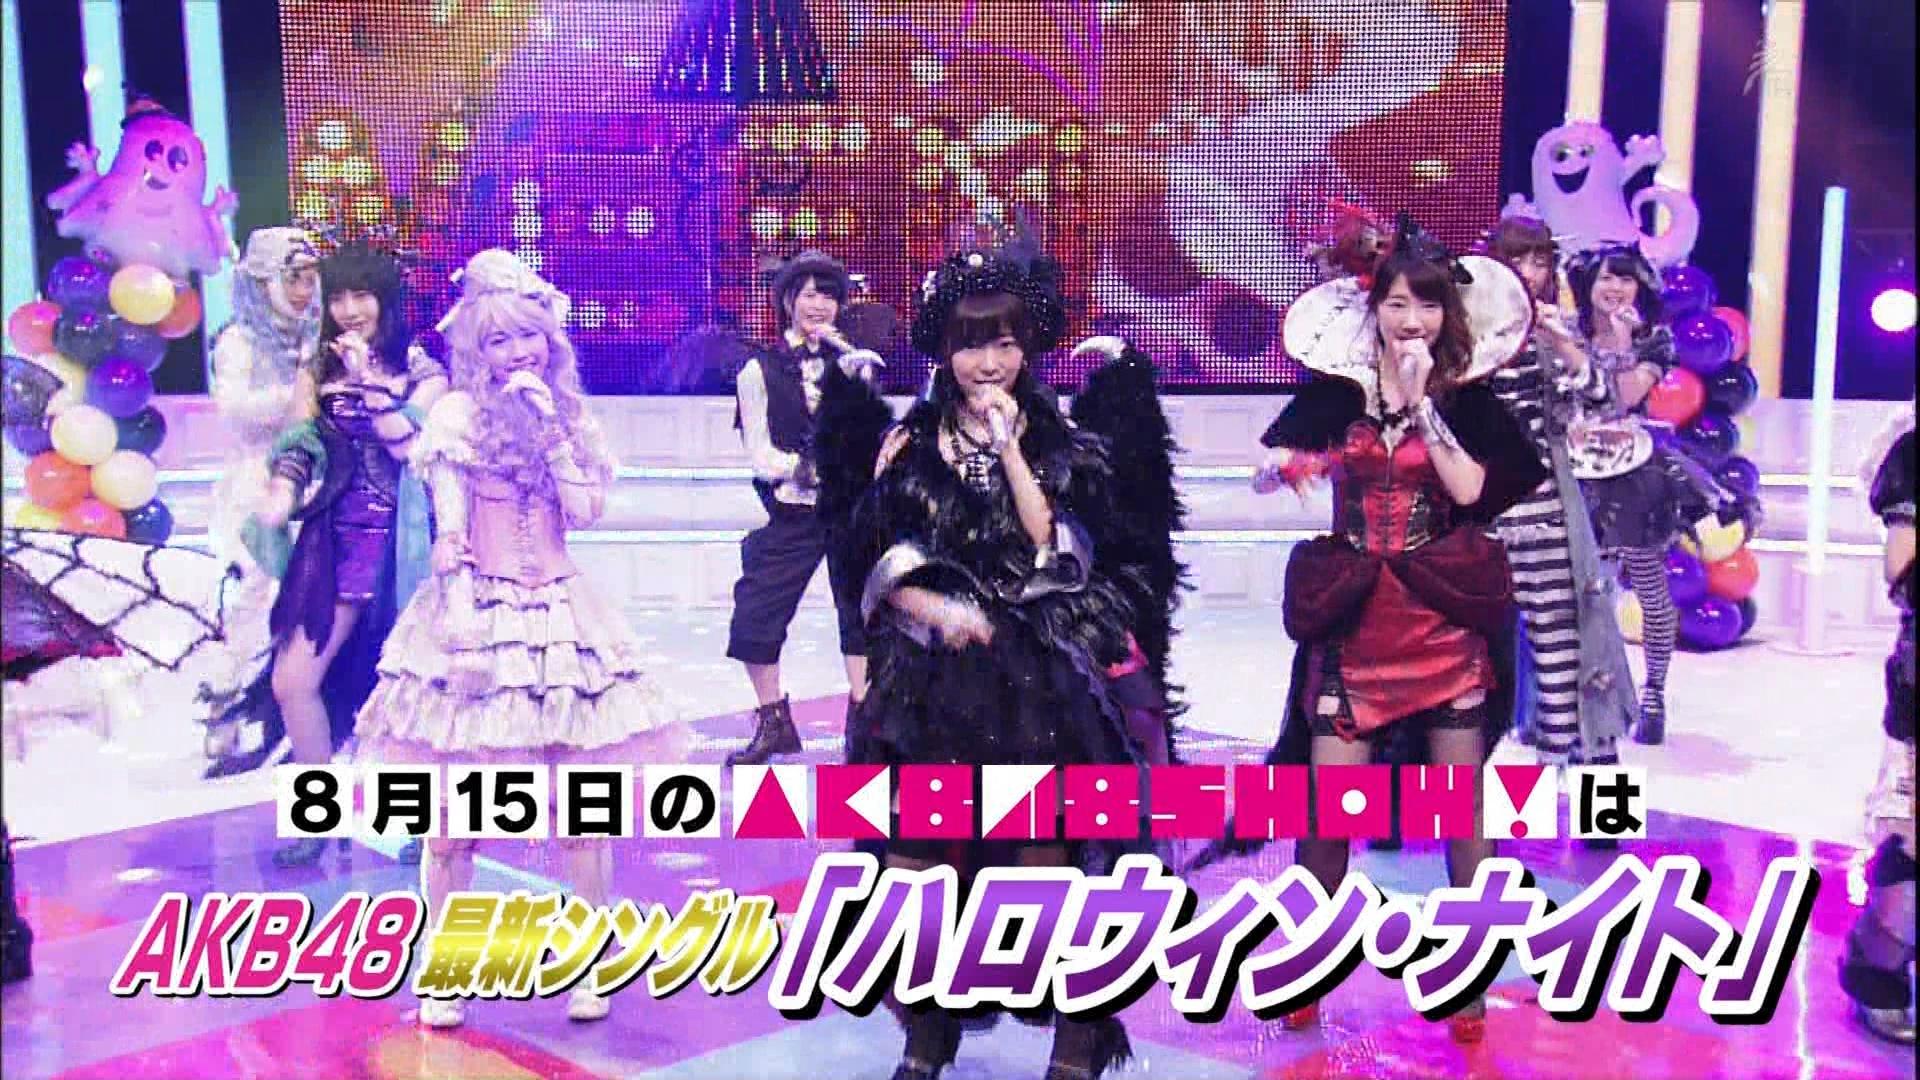 【AKB48】歌番組でのぱるるアンダーは高橋朱里に決定!